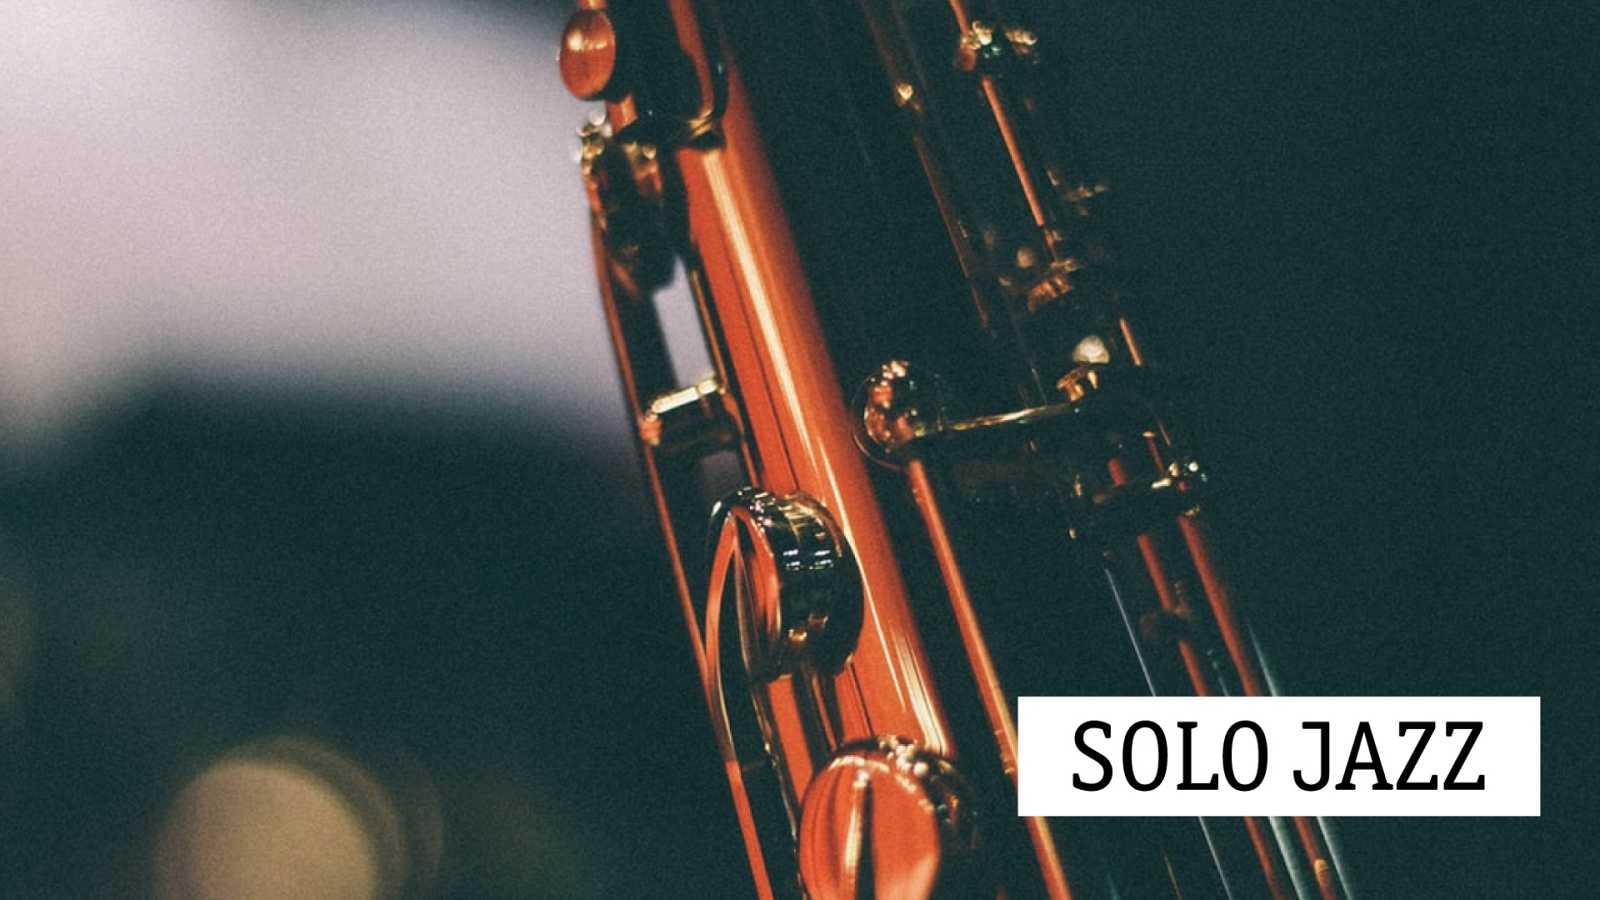 Solo jazz - Un hombre a un piano pegado. El adiós a Chick Corea - 12/02/21 - escuchar ahora